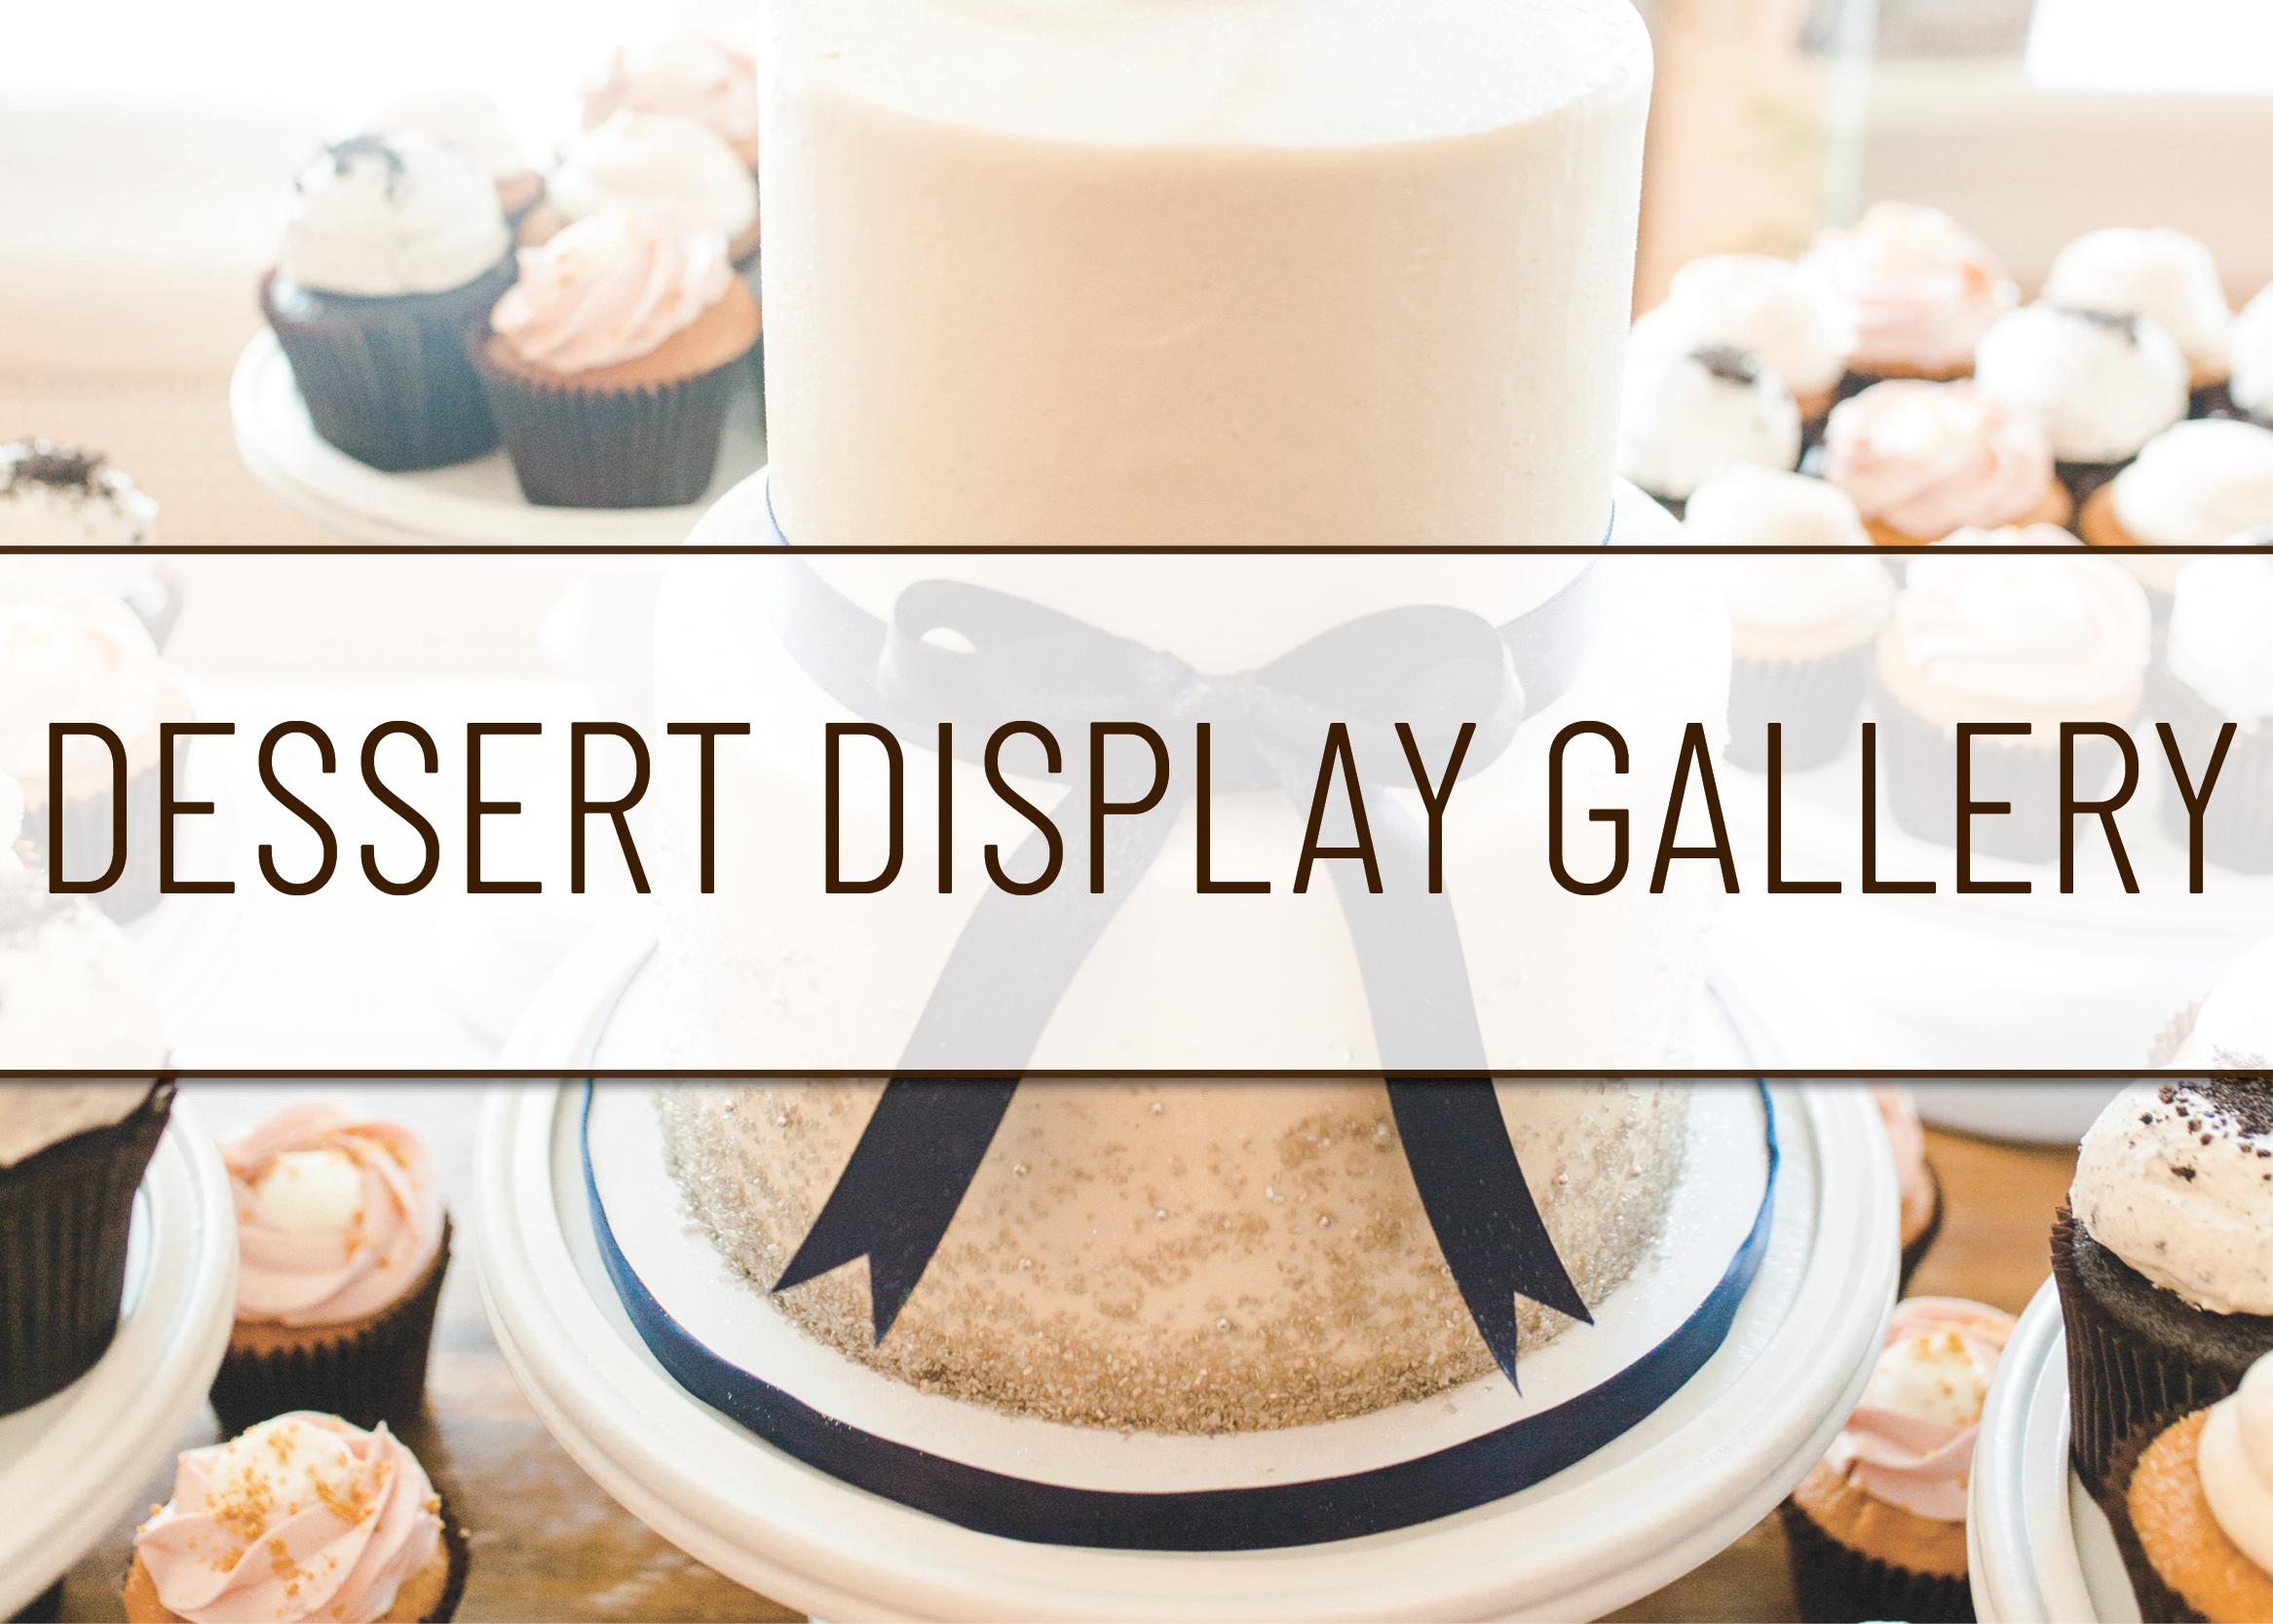 Gourmet Wedding Bridal Desserts Flavor Cupcakery Bake Shop